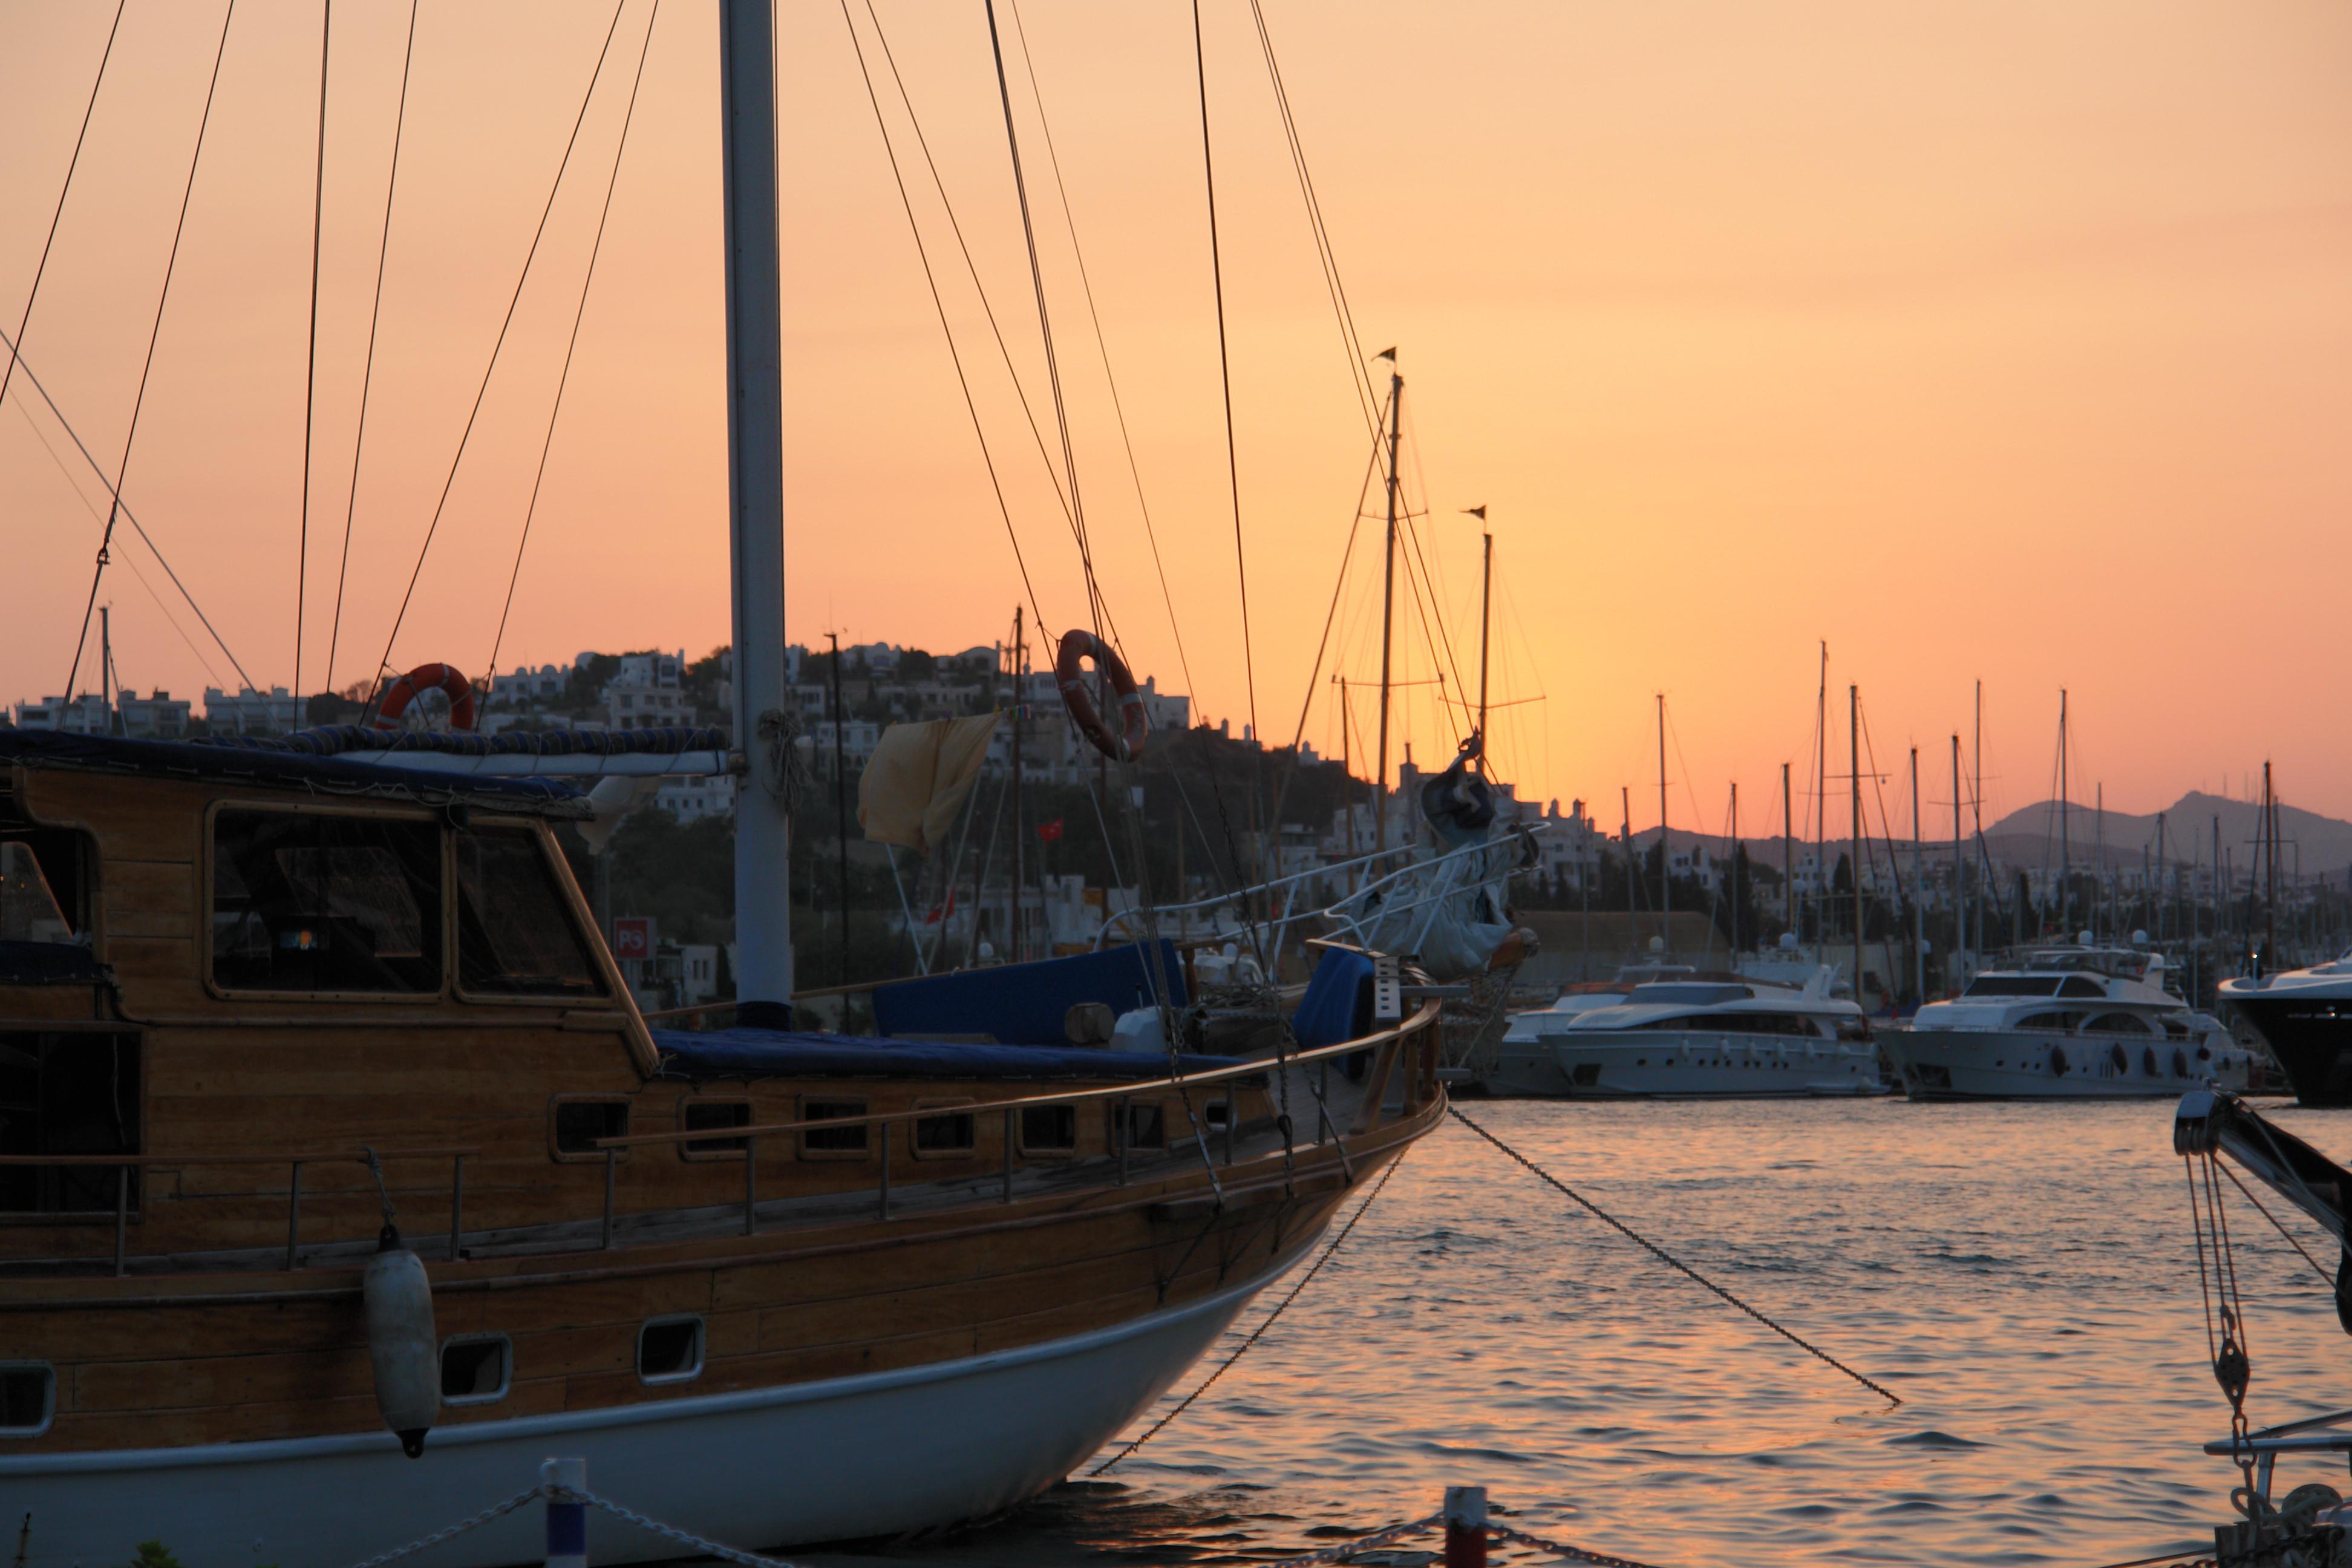 Bodrum yacht marina, Boats, Bodrum, Harbor, Marina, HQ Photo